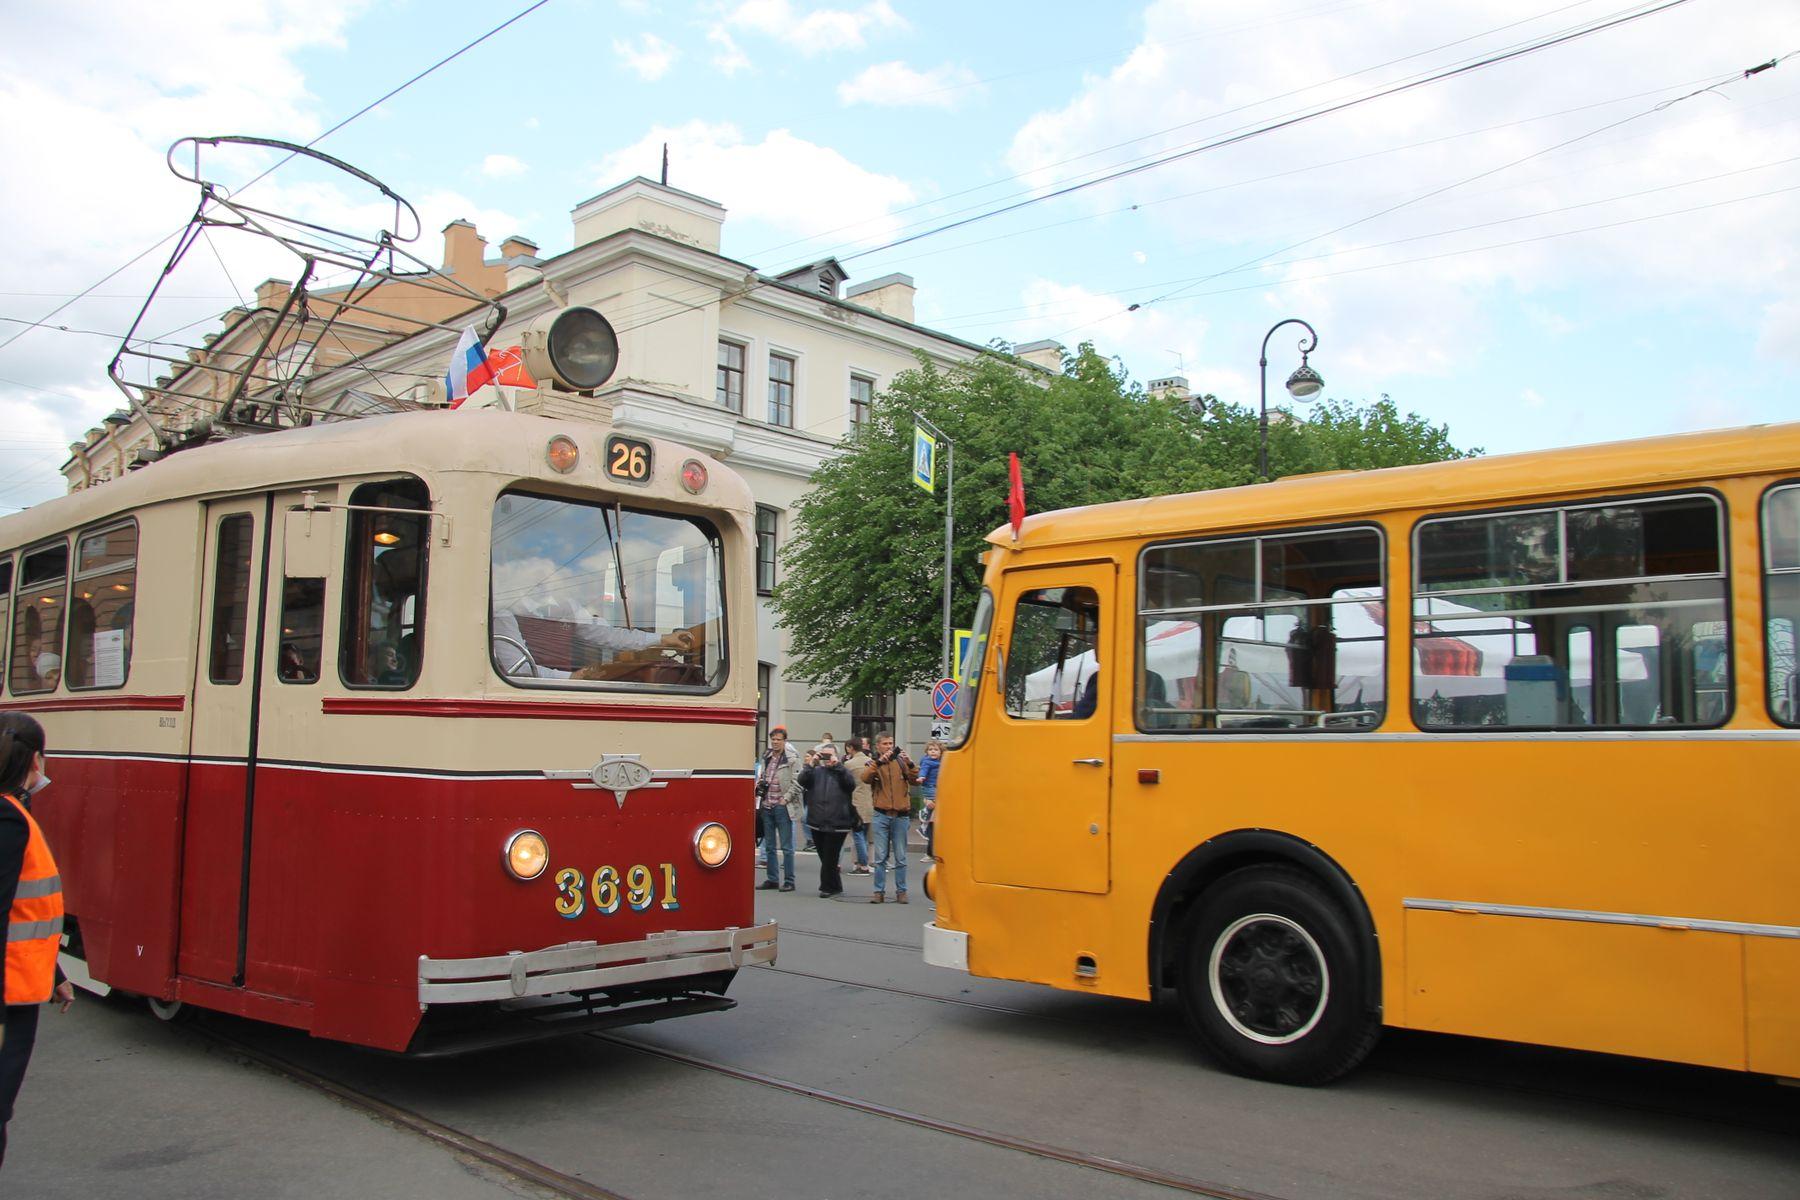 встреча автобус трамвай ЛМ-49 ЛиАЗ-677М Санкт-Петербкрг Петербург